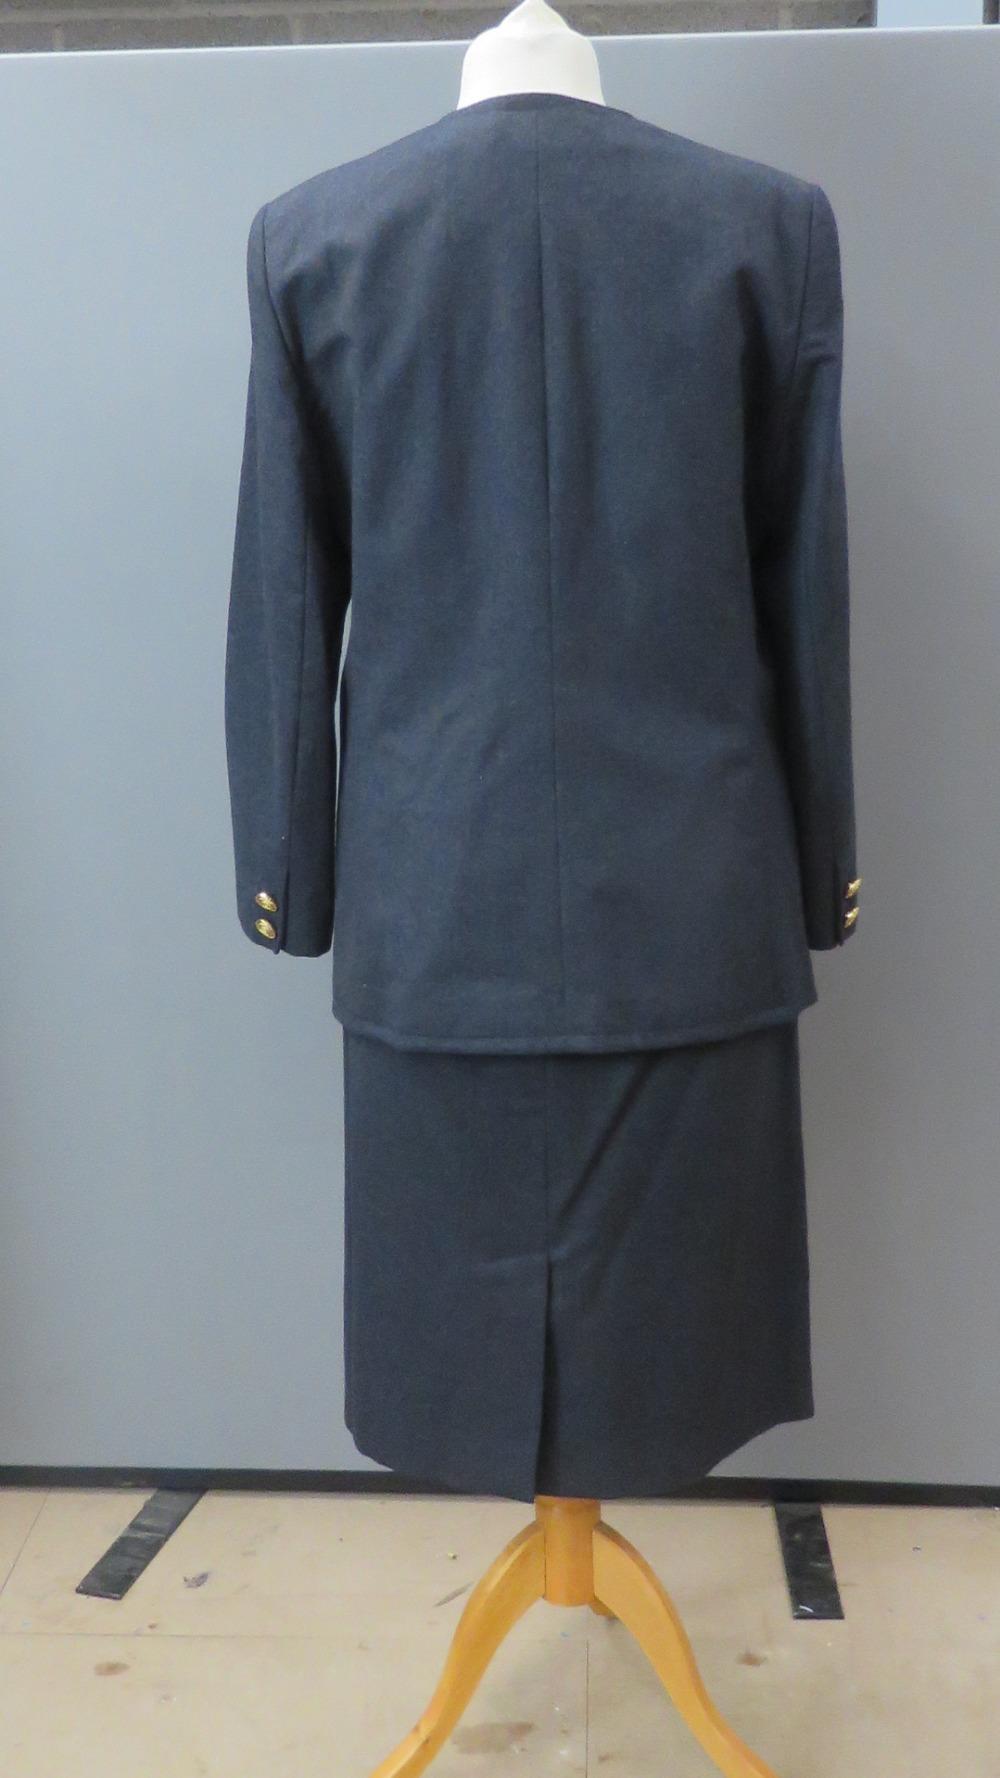 Viyella; 100% pure new wool ladies jacke - Image 2 of 7